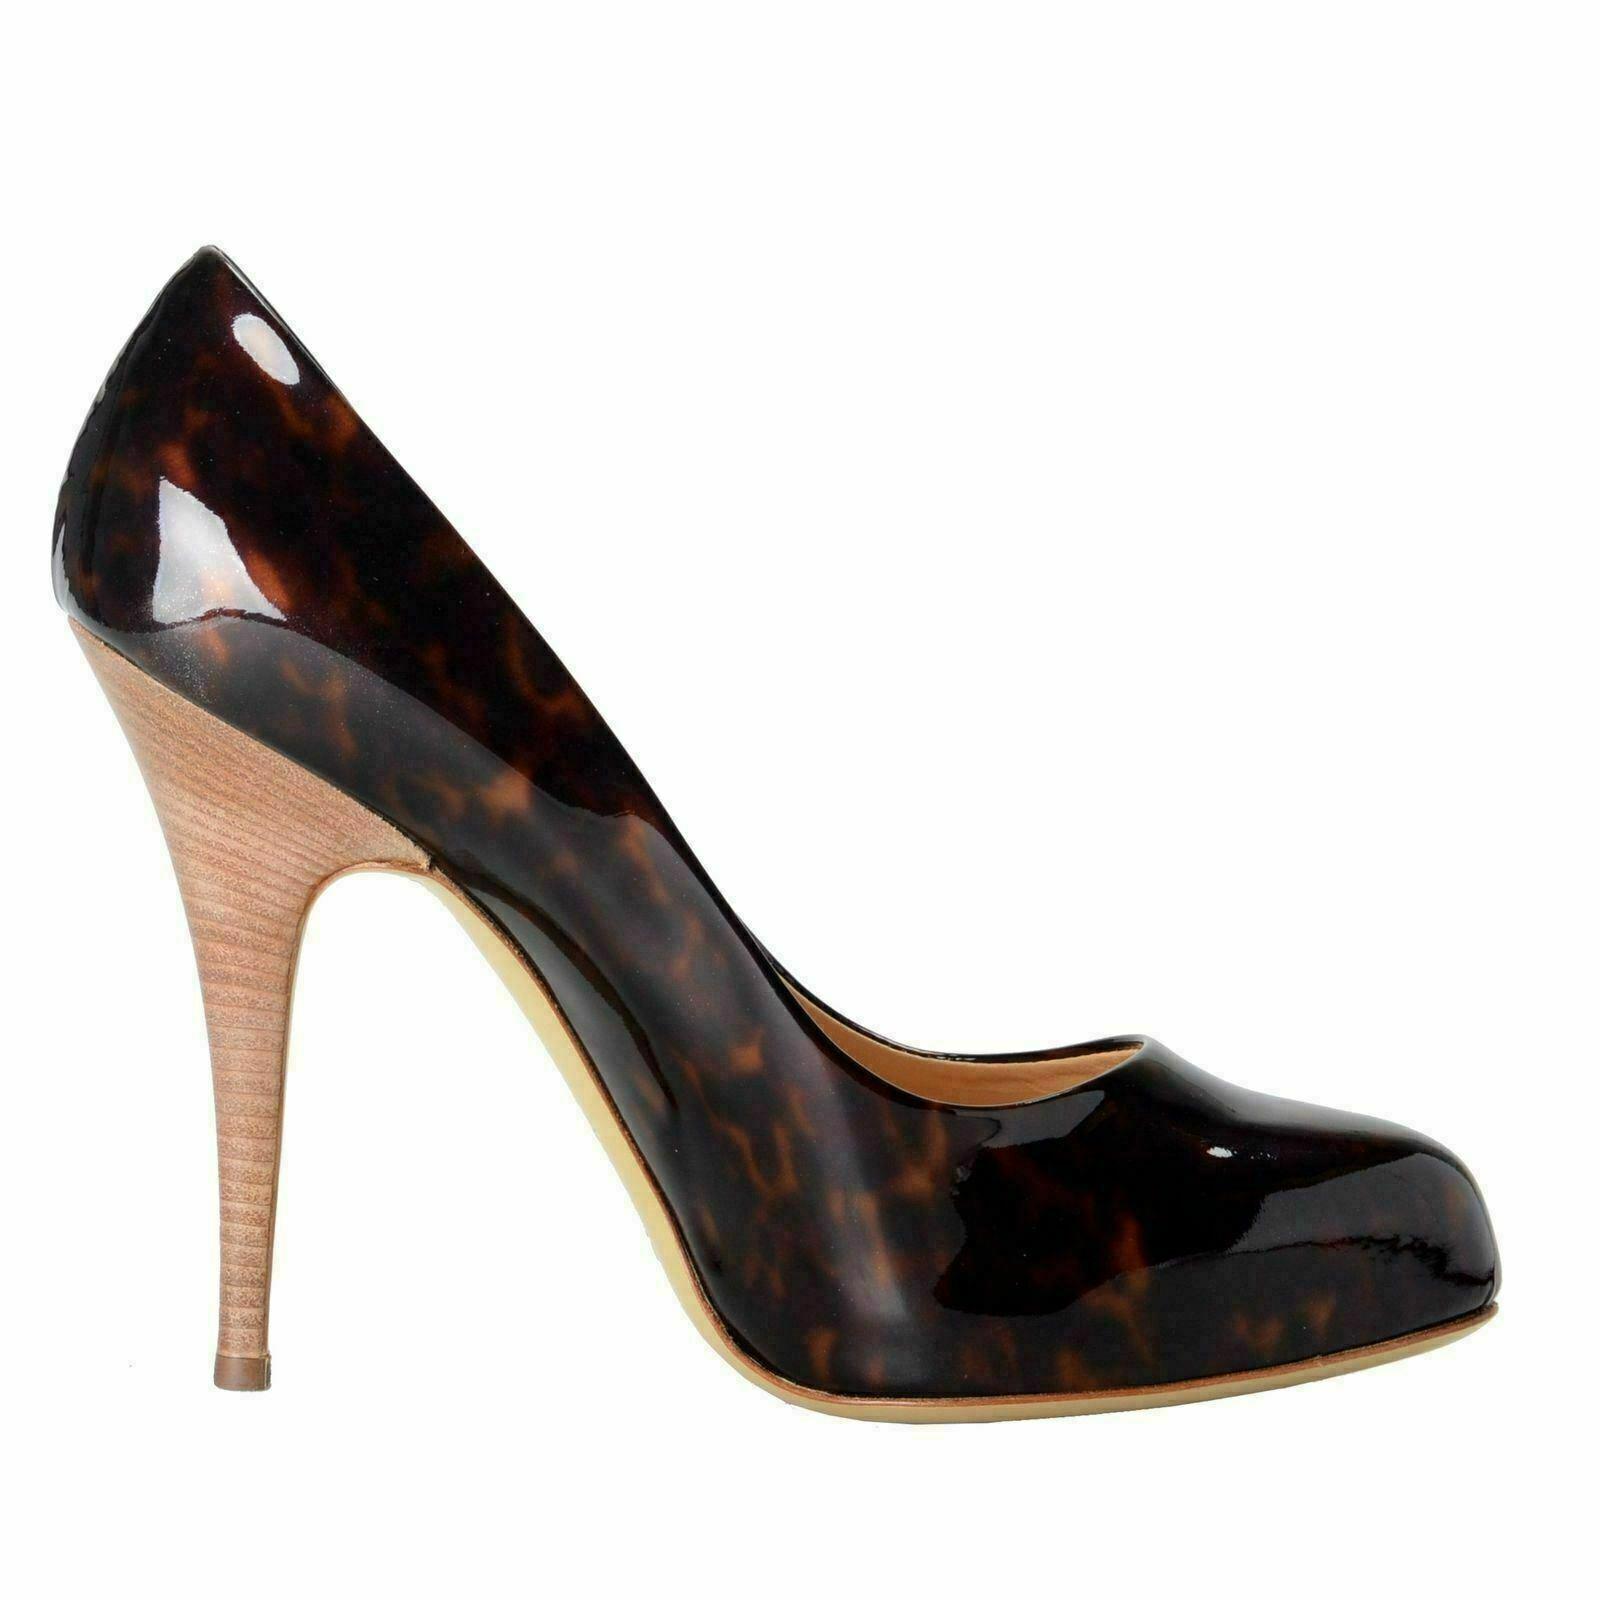 Giuseppe Zanotti Design Women's Brown High Heels Pumps shoes shoes shoes US 9 IT 40 e50ba8